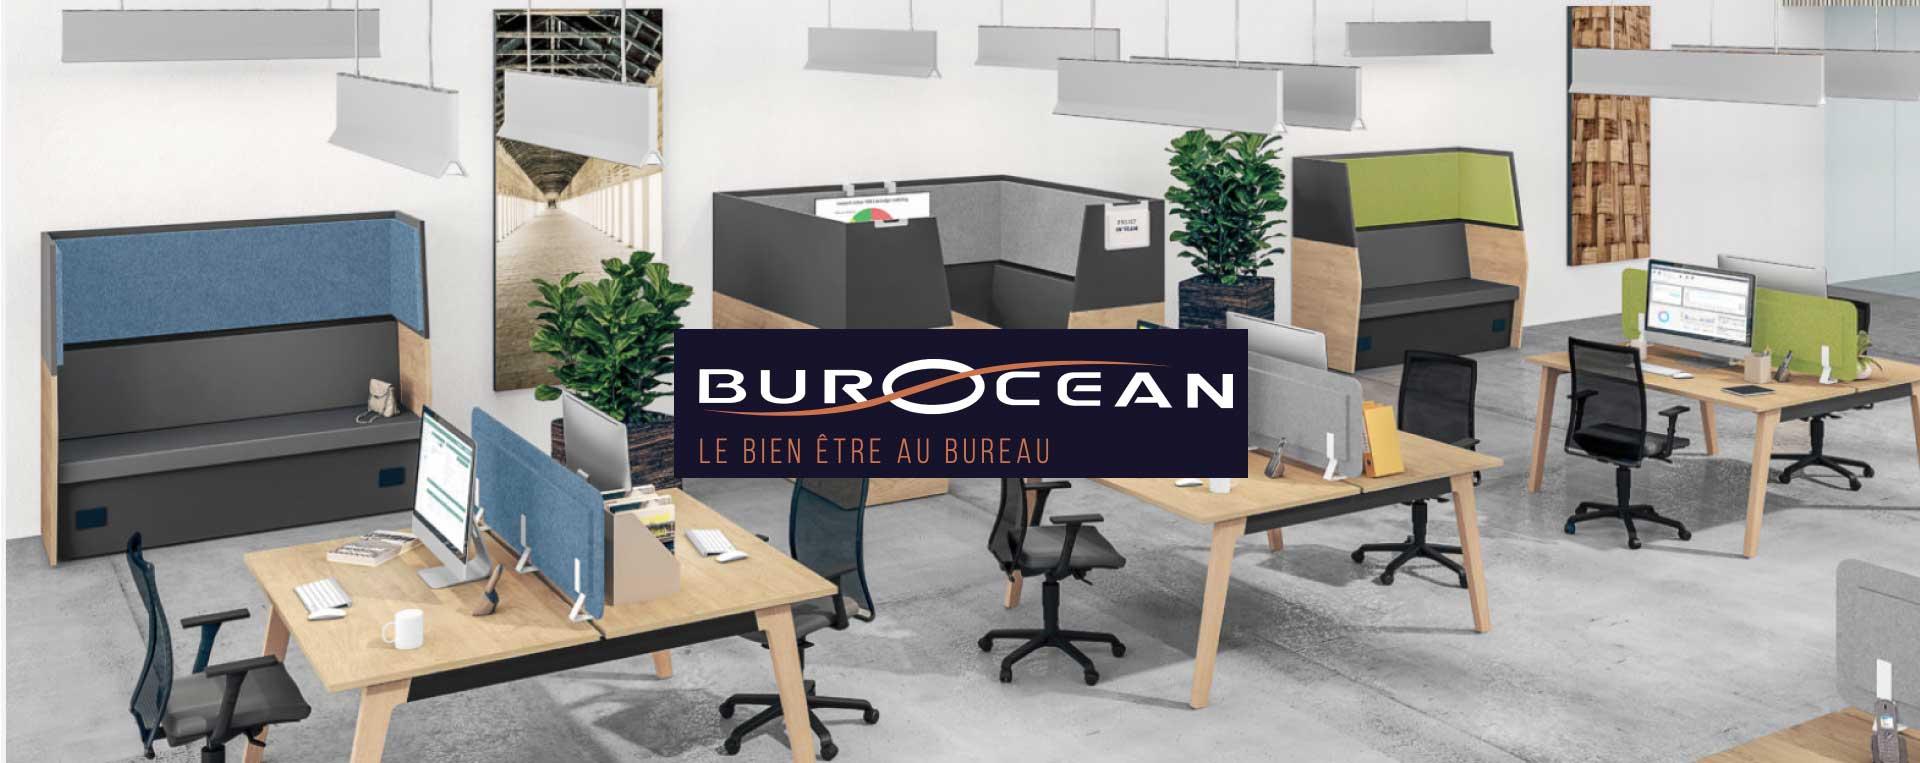 Vente de mobilier de bureau